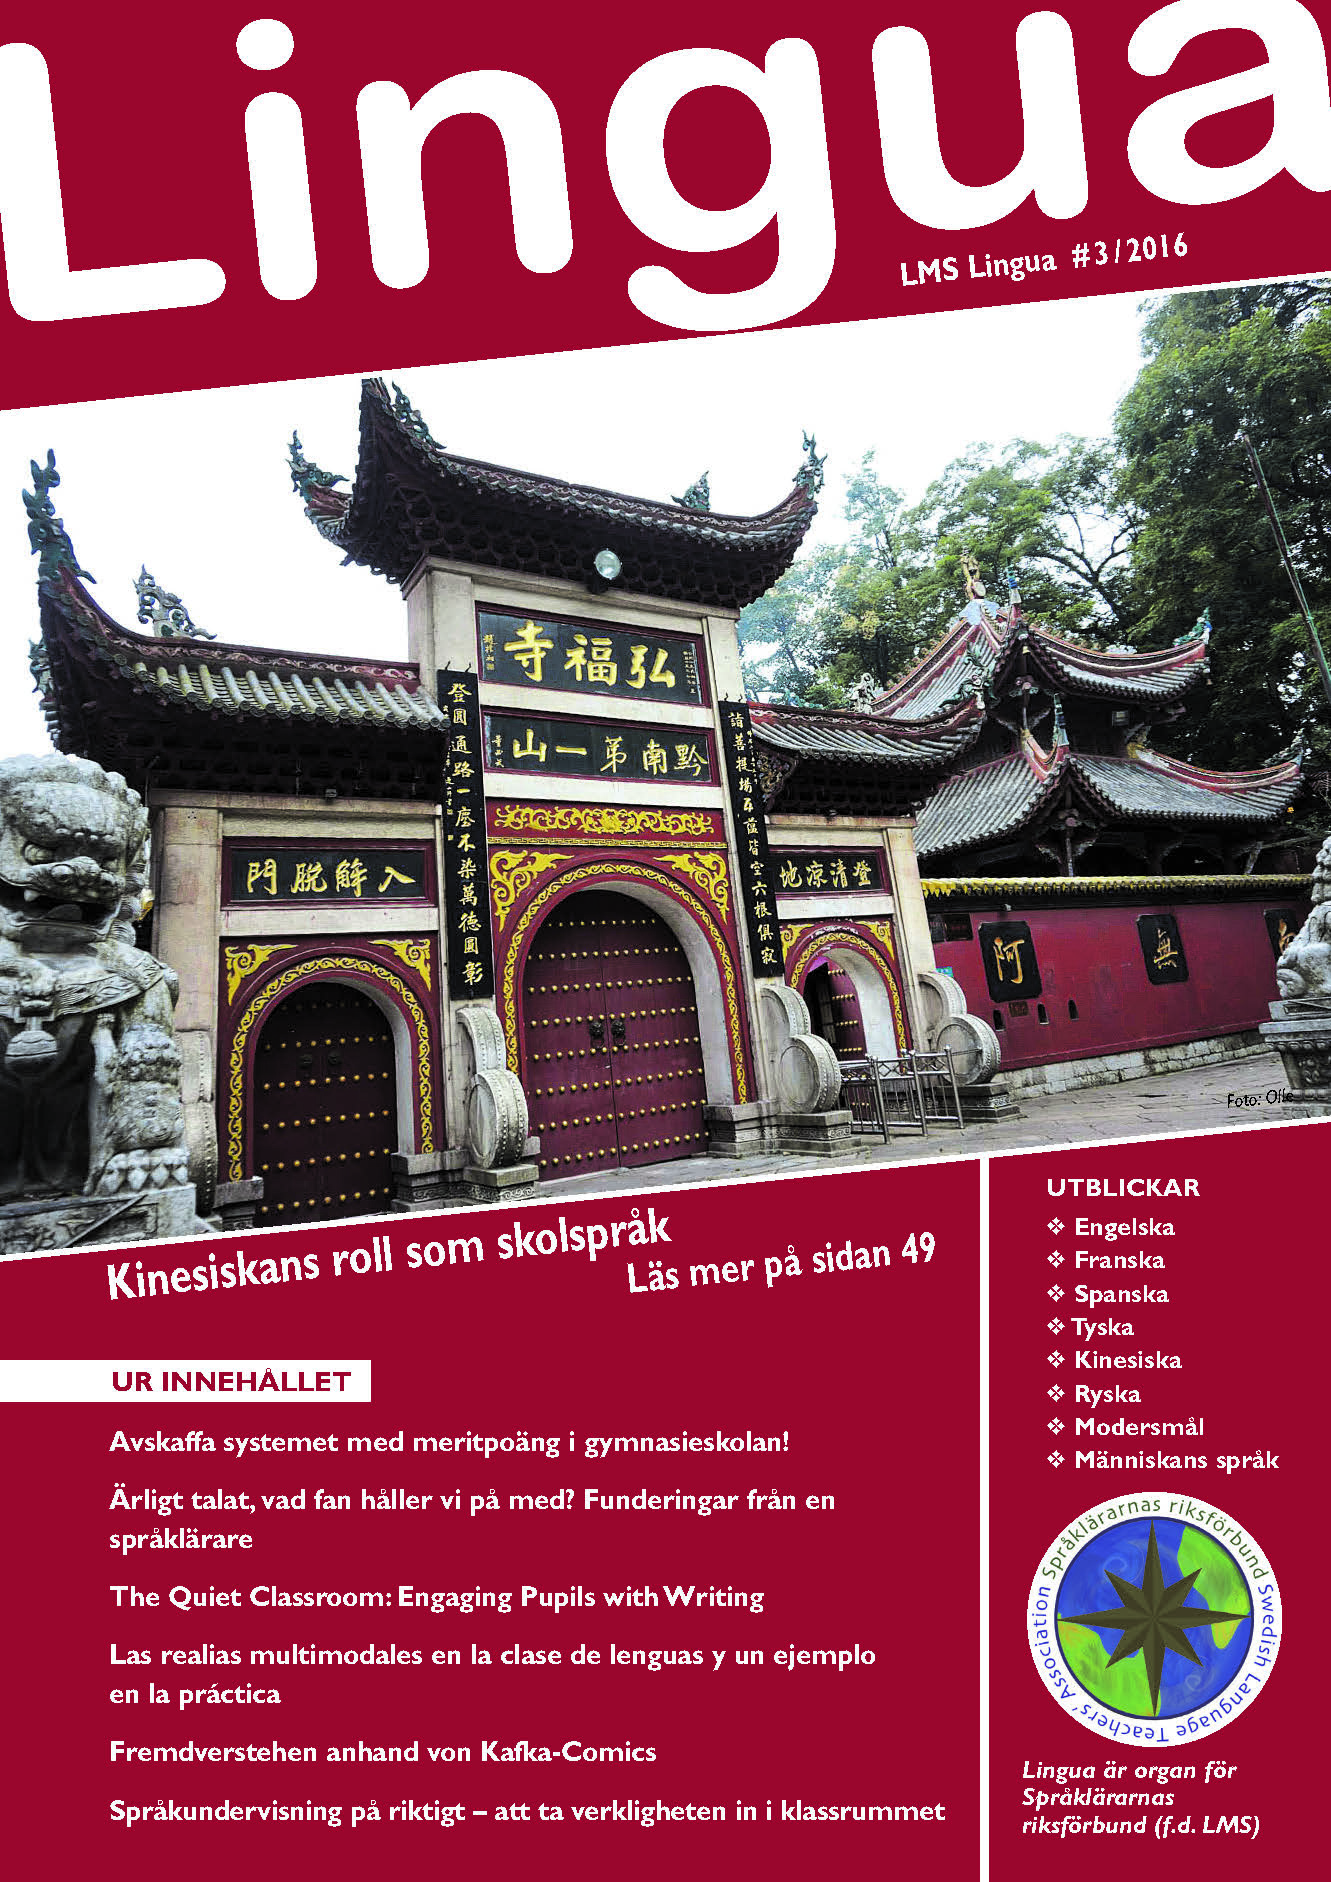 lingua-3-2016-framsida